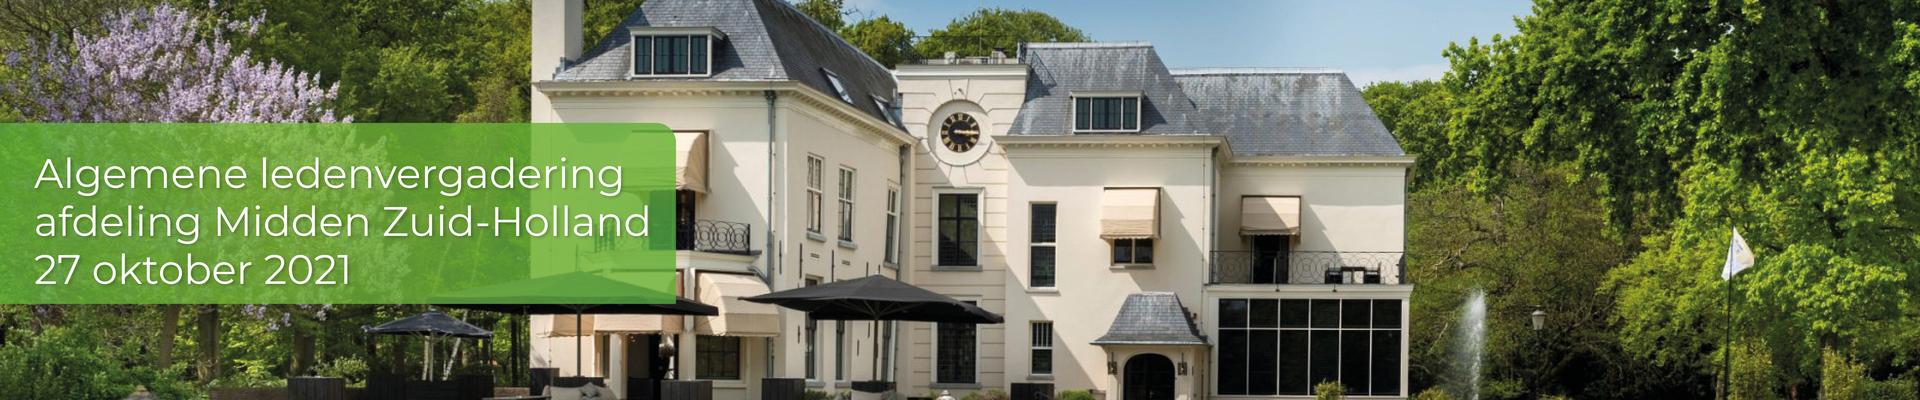 Algemene ledenvergadering afdeling Midden Zuid-Holland